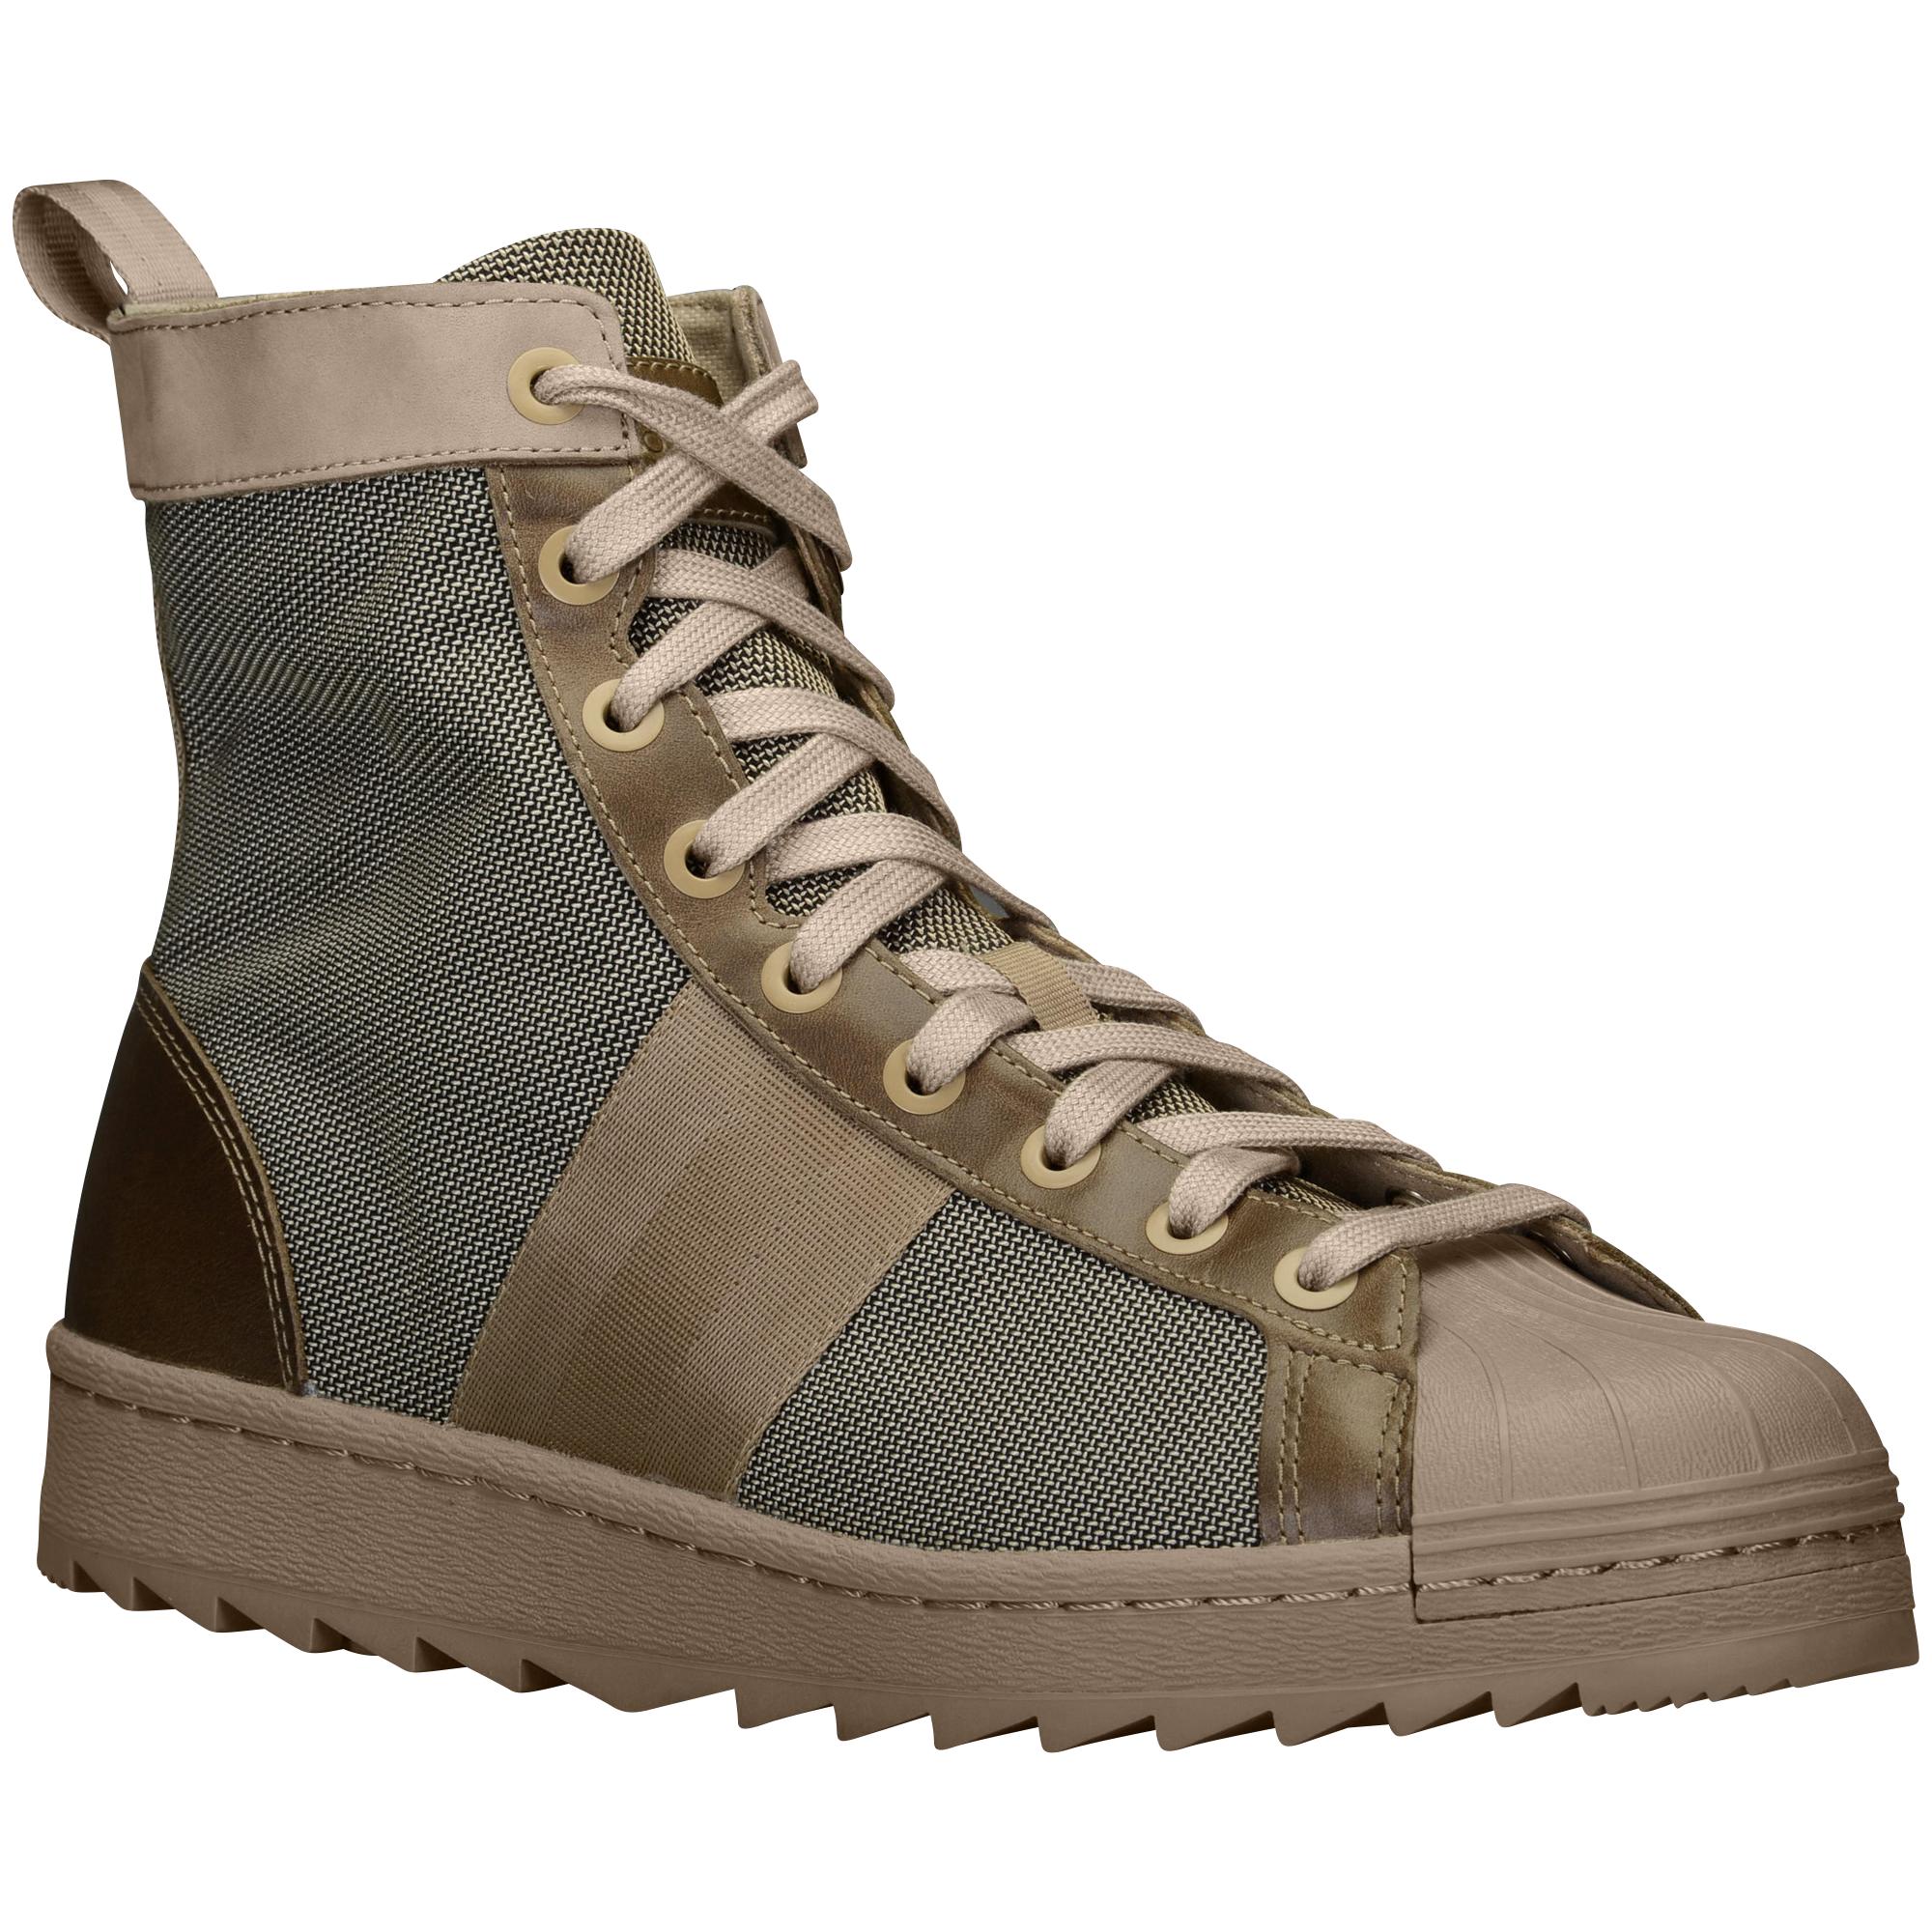 Adidas Originals Herren Superstars Jungle Stiefel Schuhe